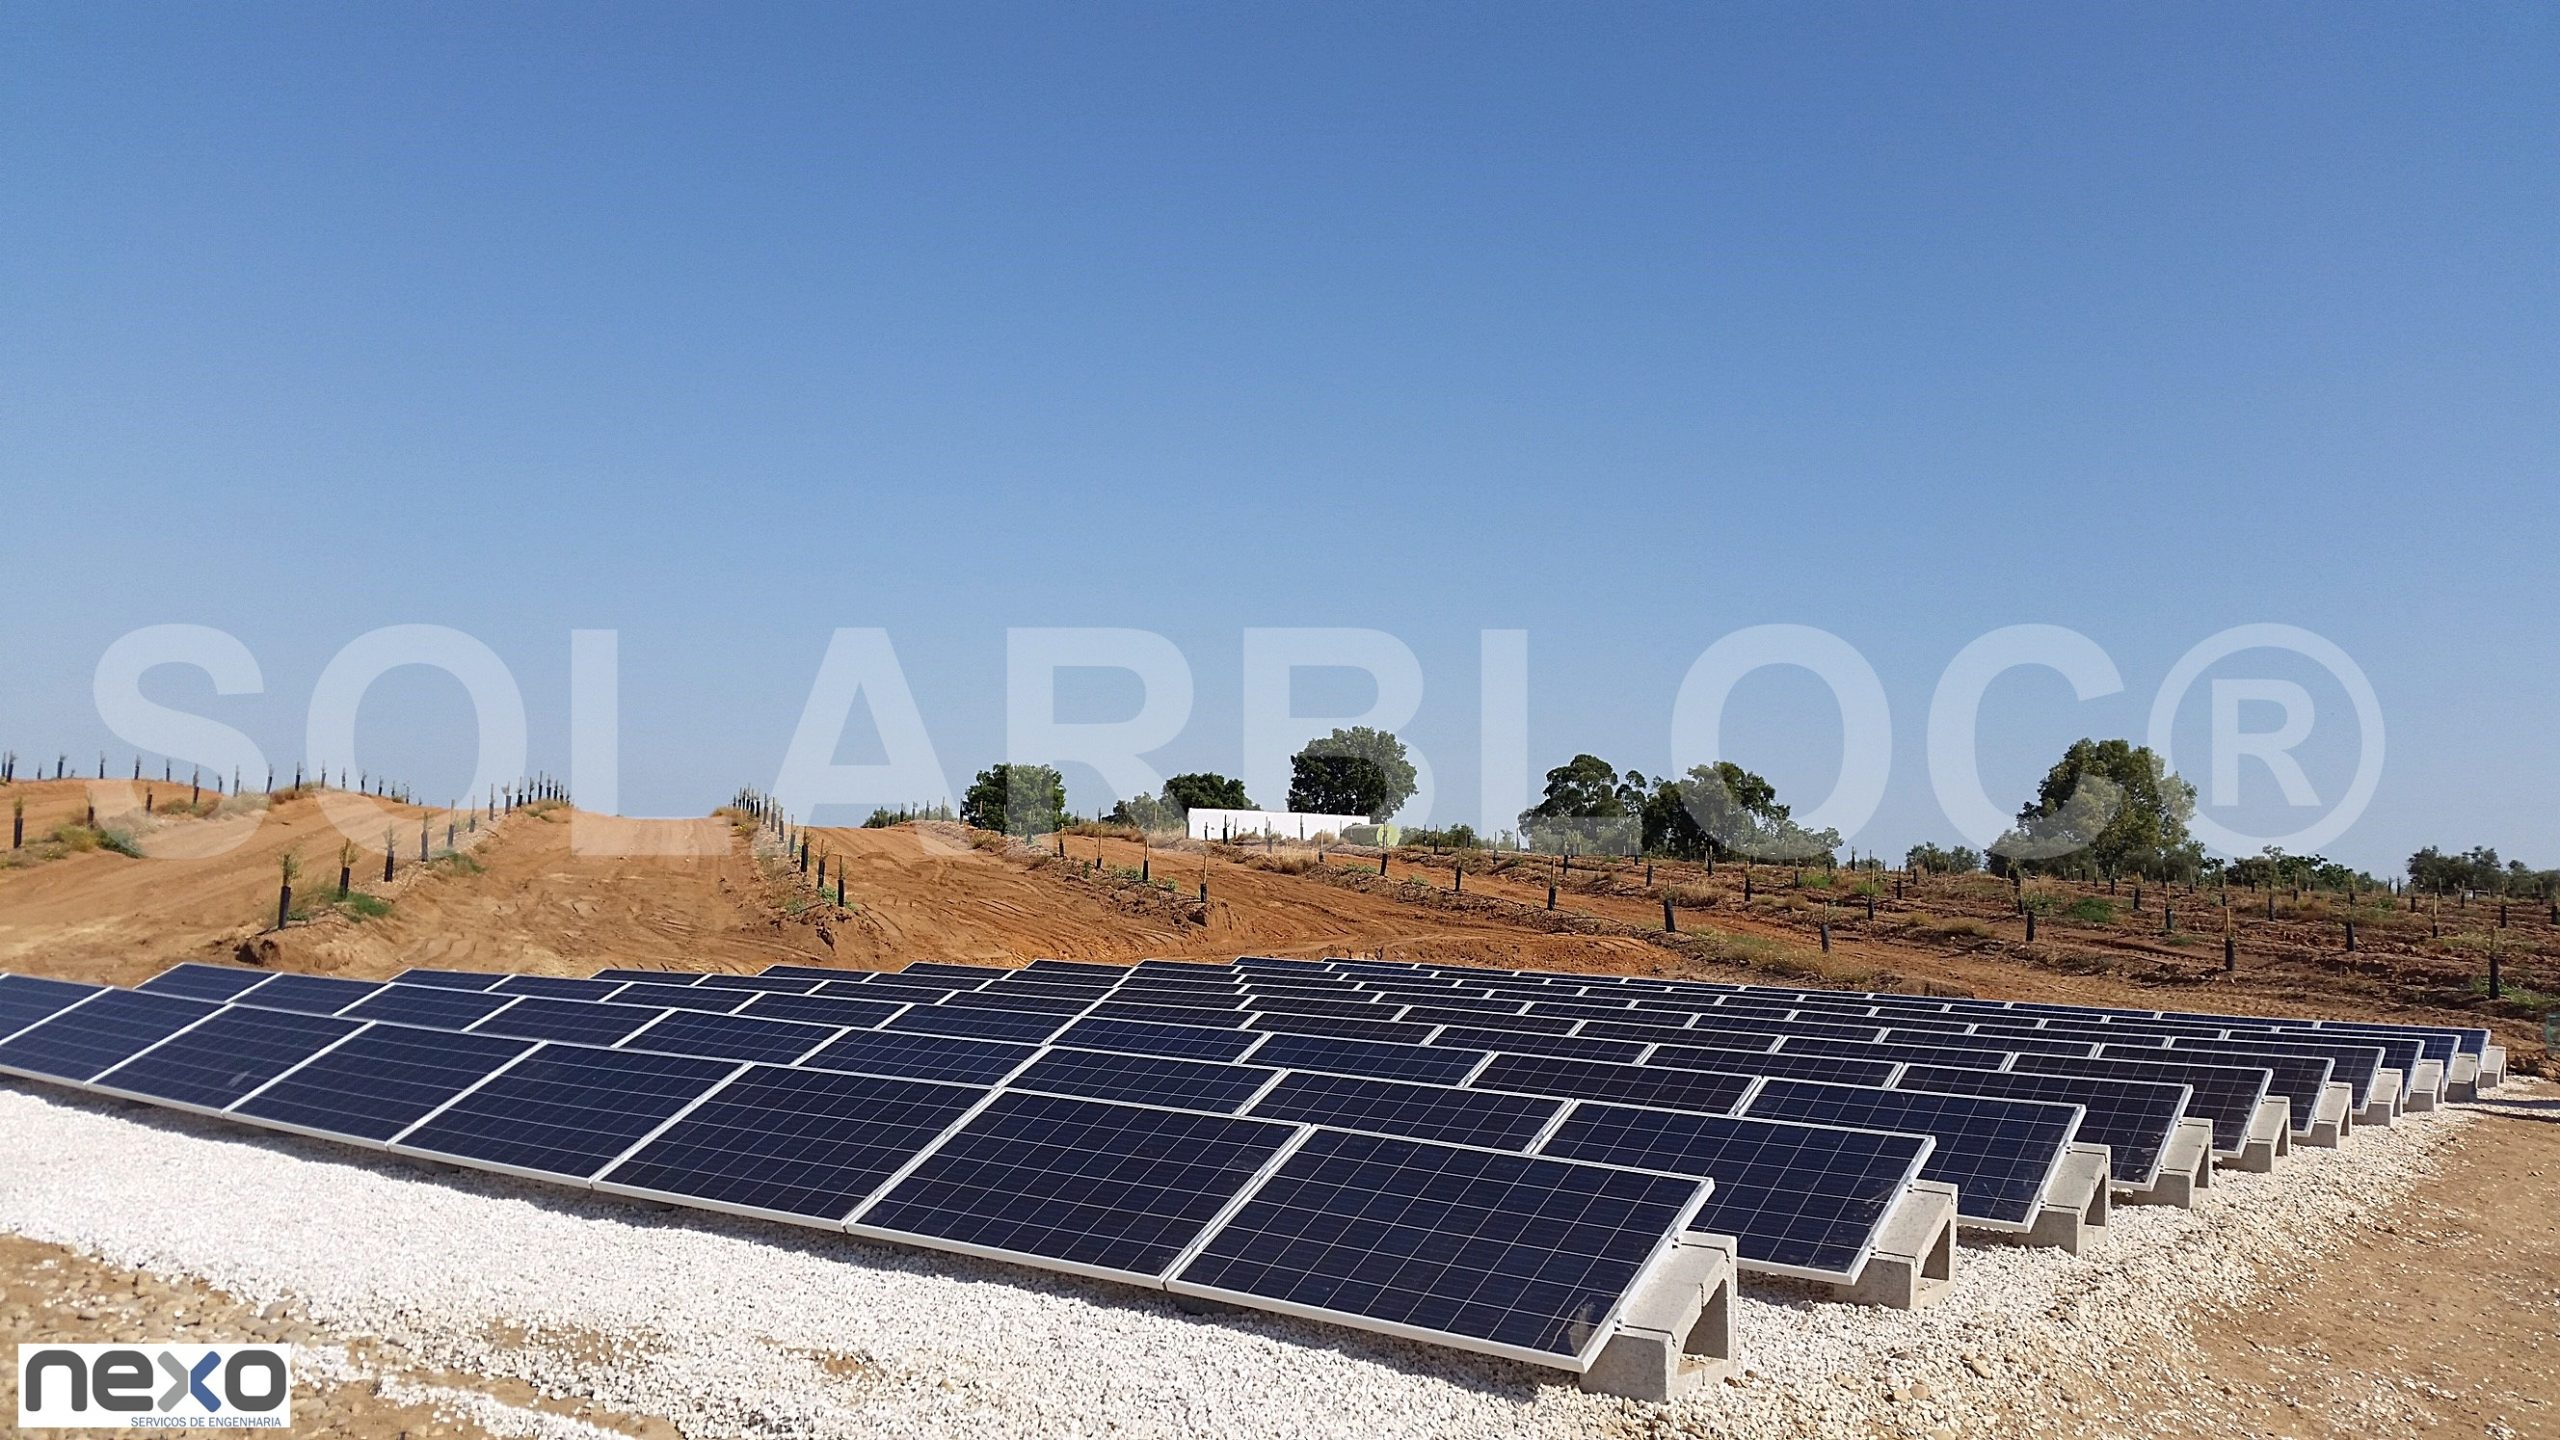 nexo-soportes-paneles-solarbloc